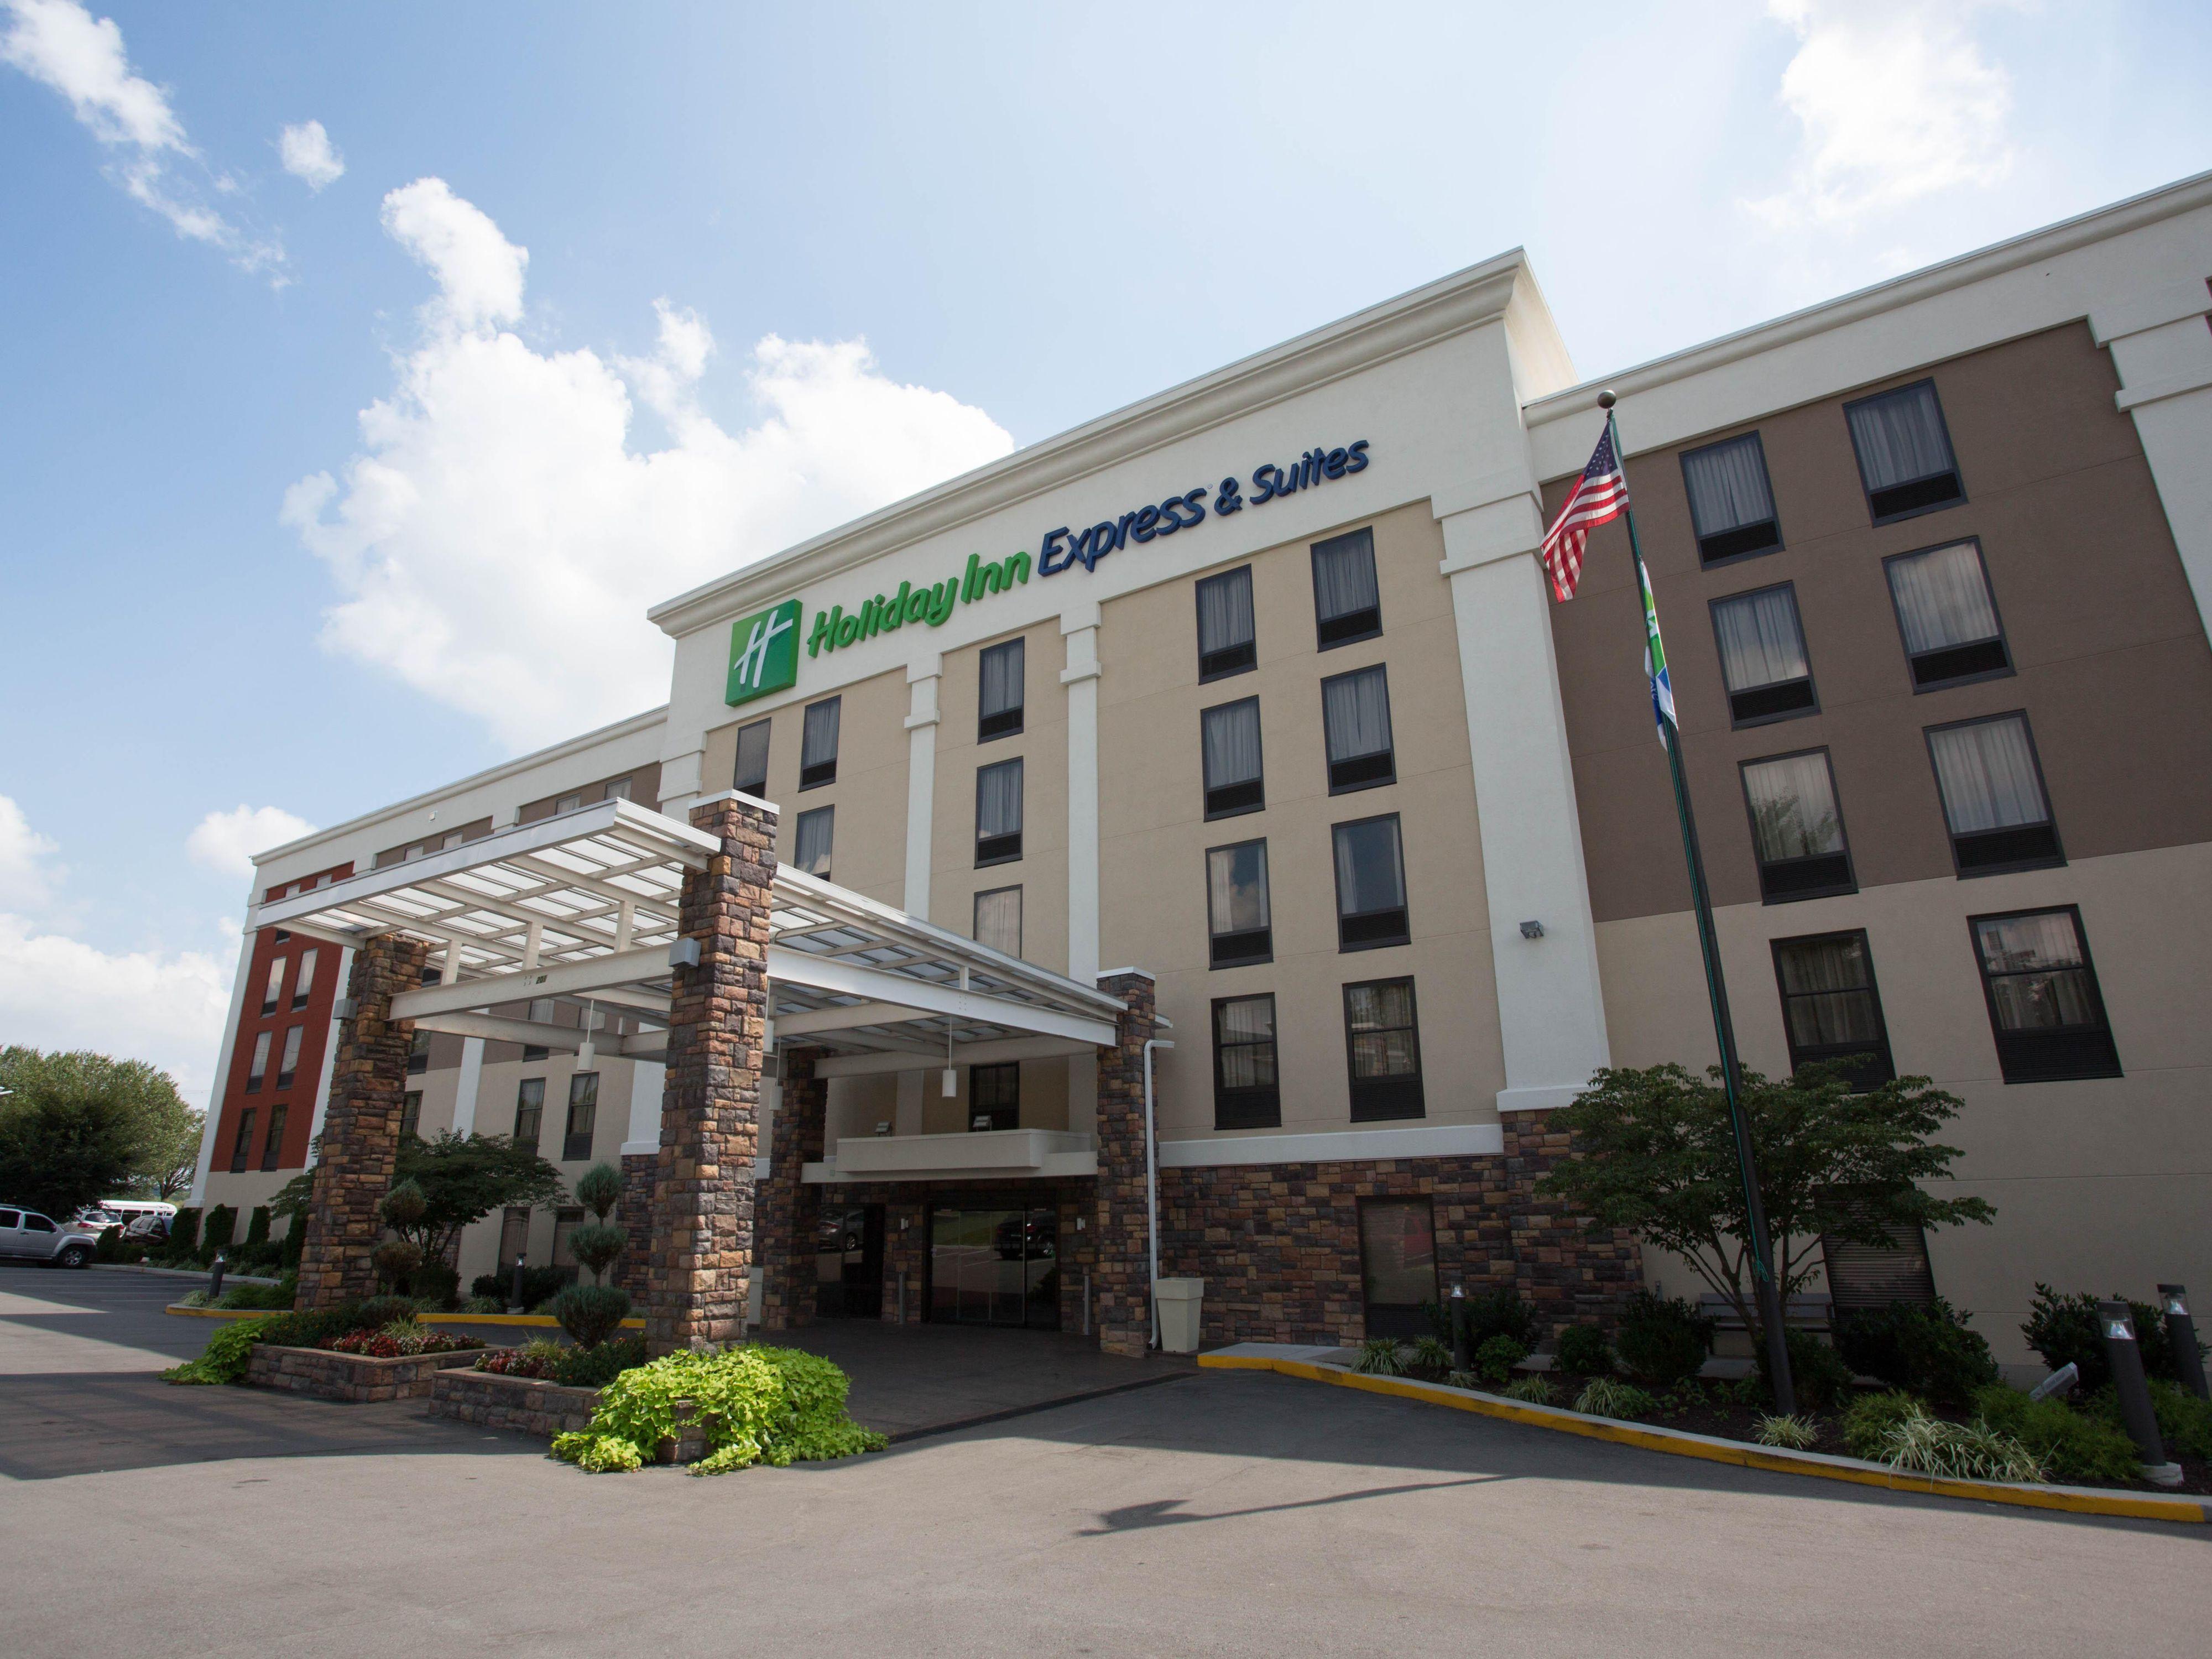 Hotels Near Nashville, TN Airport | Holiday Inn Express & Suites